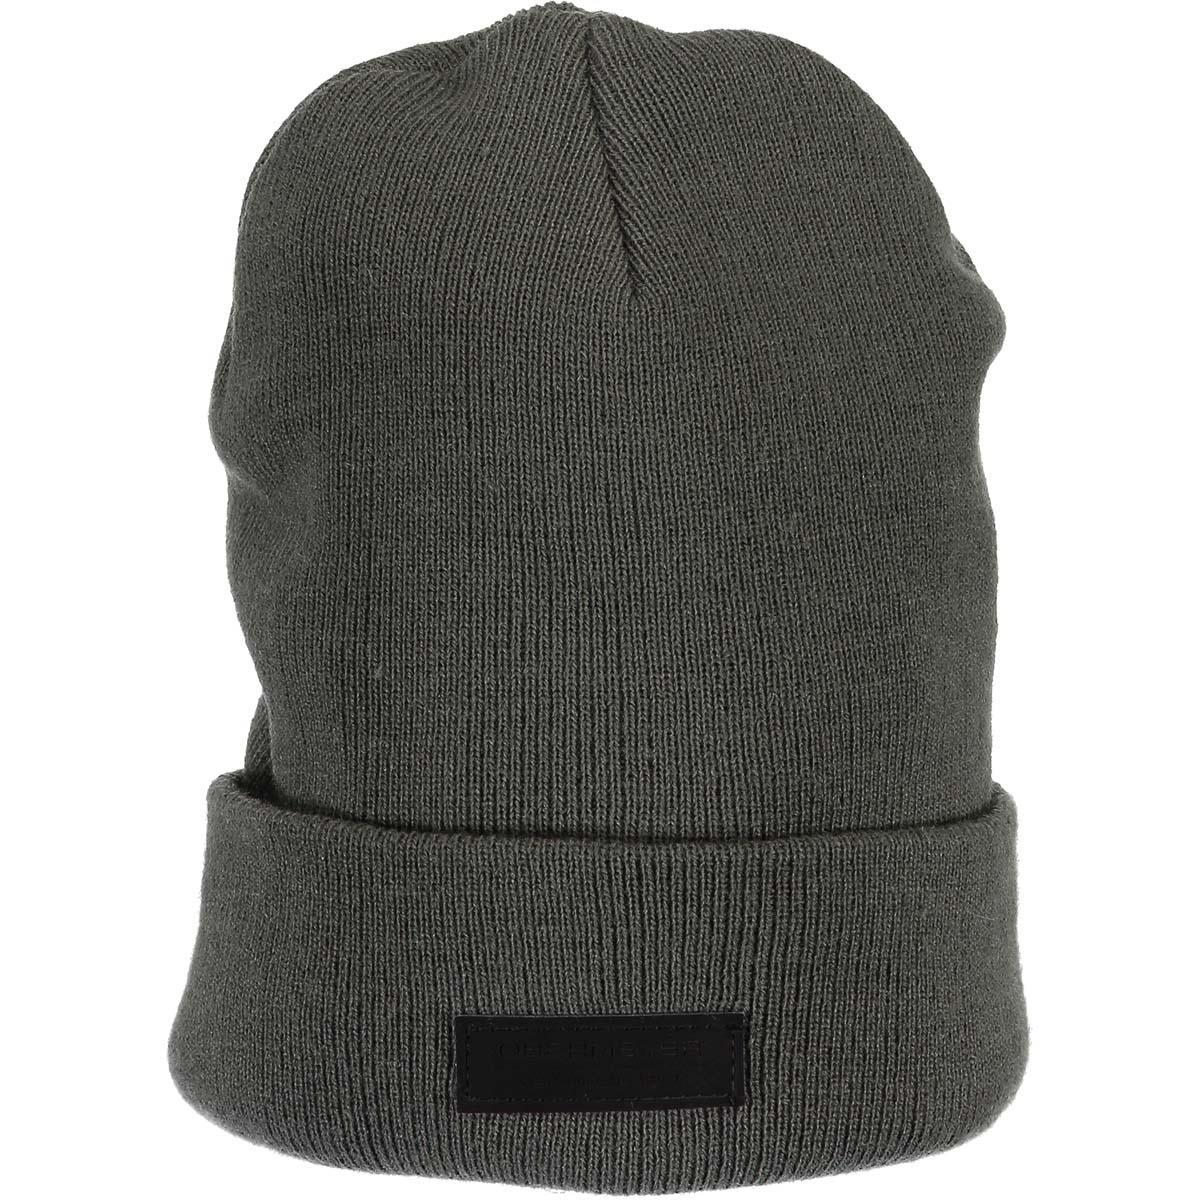 d9b58c1baeb Obermeyer Foldover Knit Hat Mens. Loading zoom